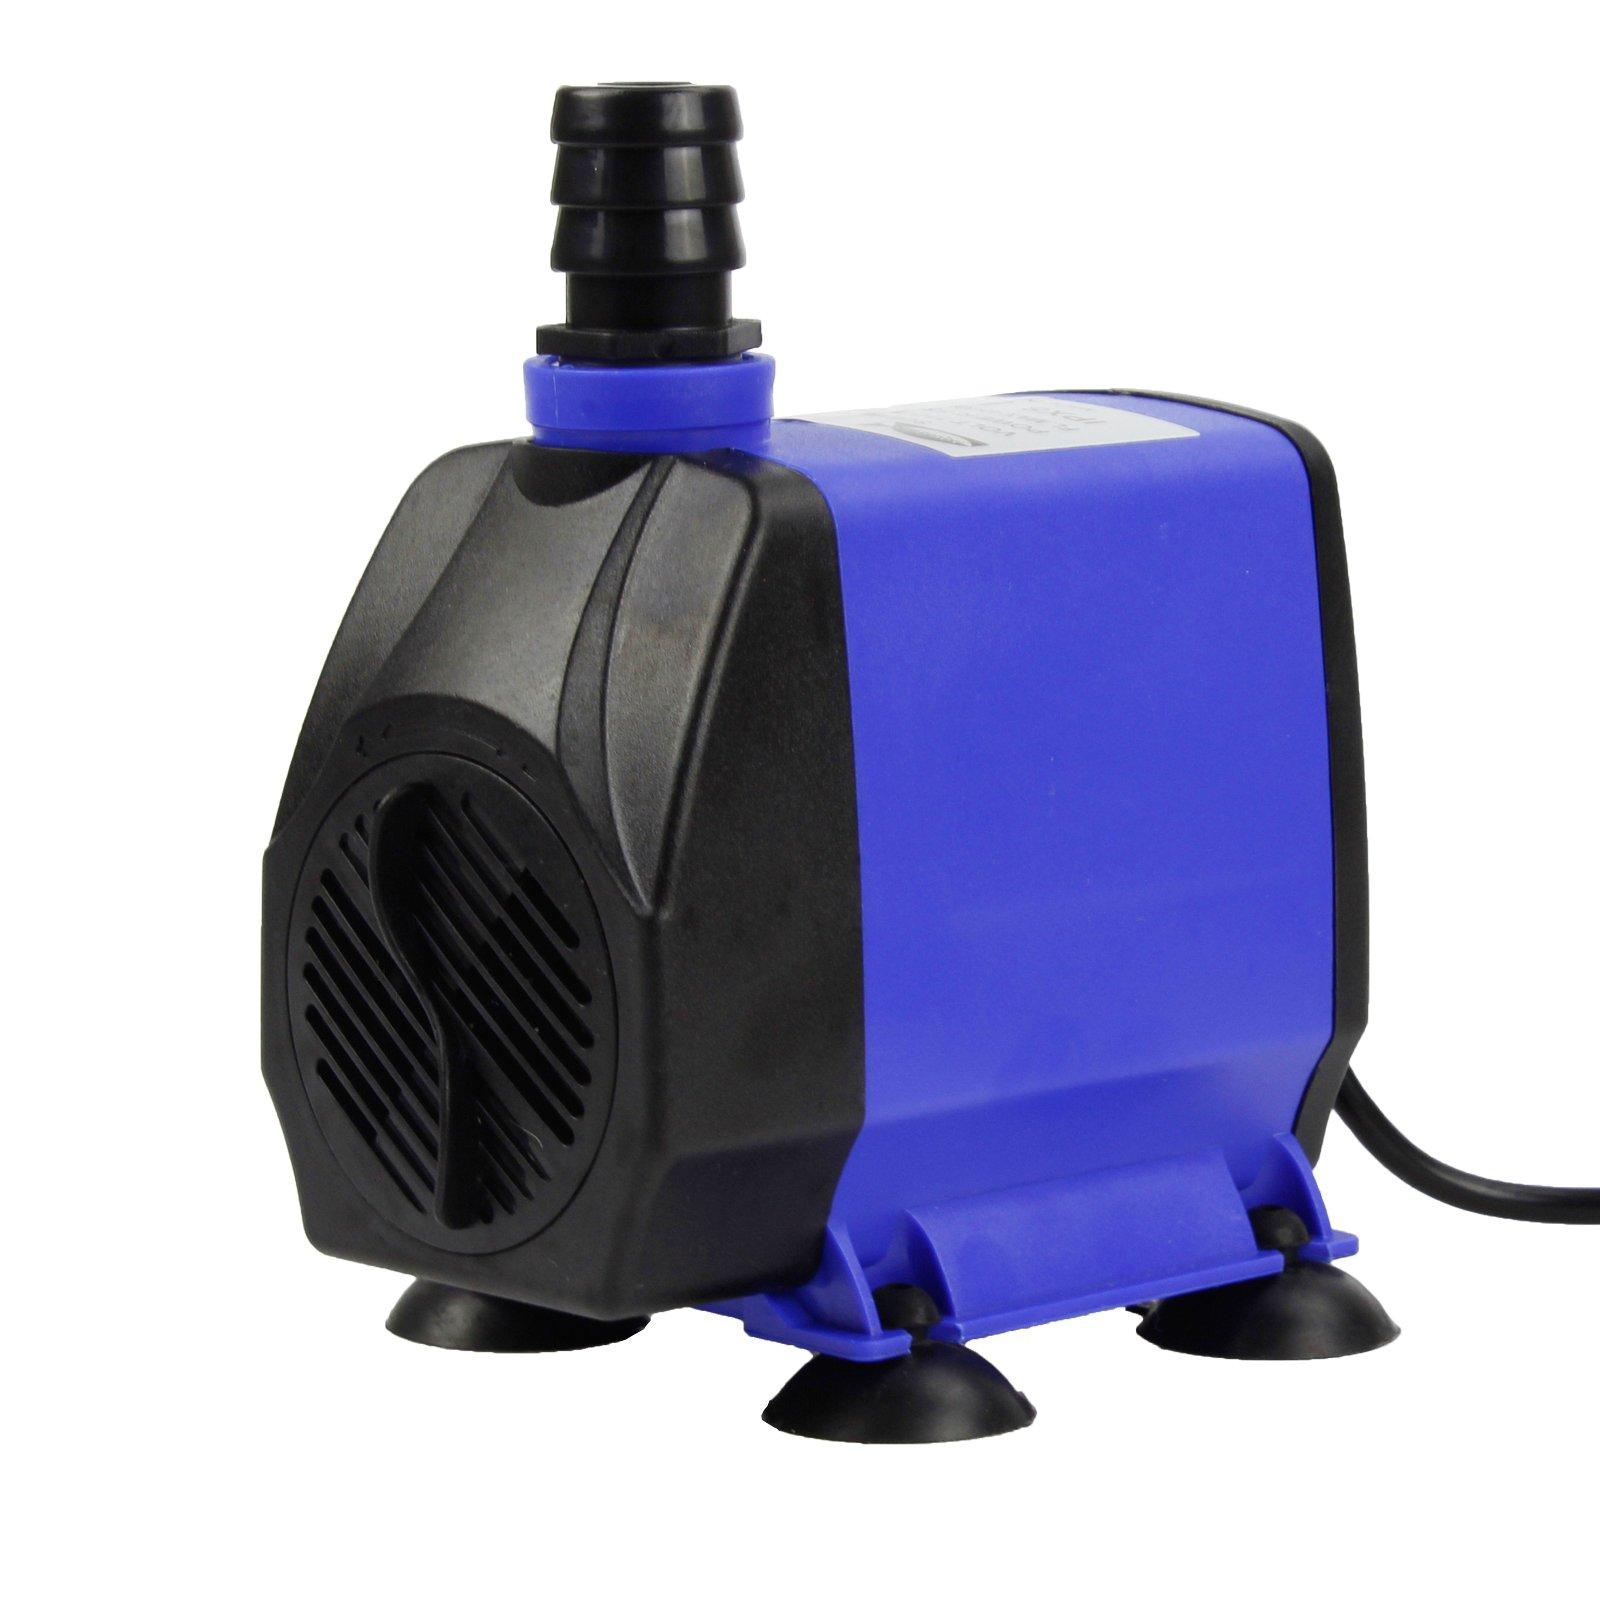 AQUANEAT 1200 GPH Submersible Water Pump Adjustable Powerhead Aquarium Fish Tank Fountain Hydroponic